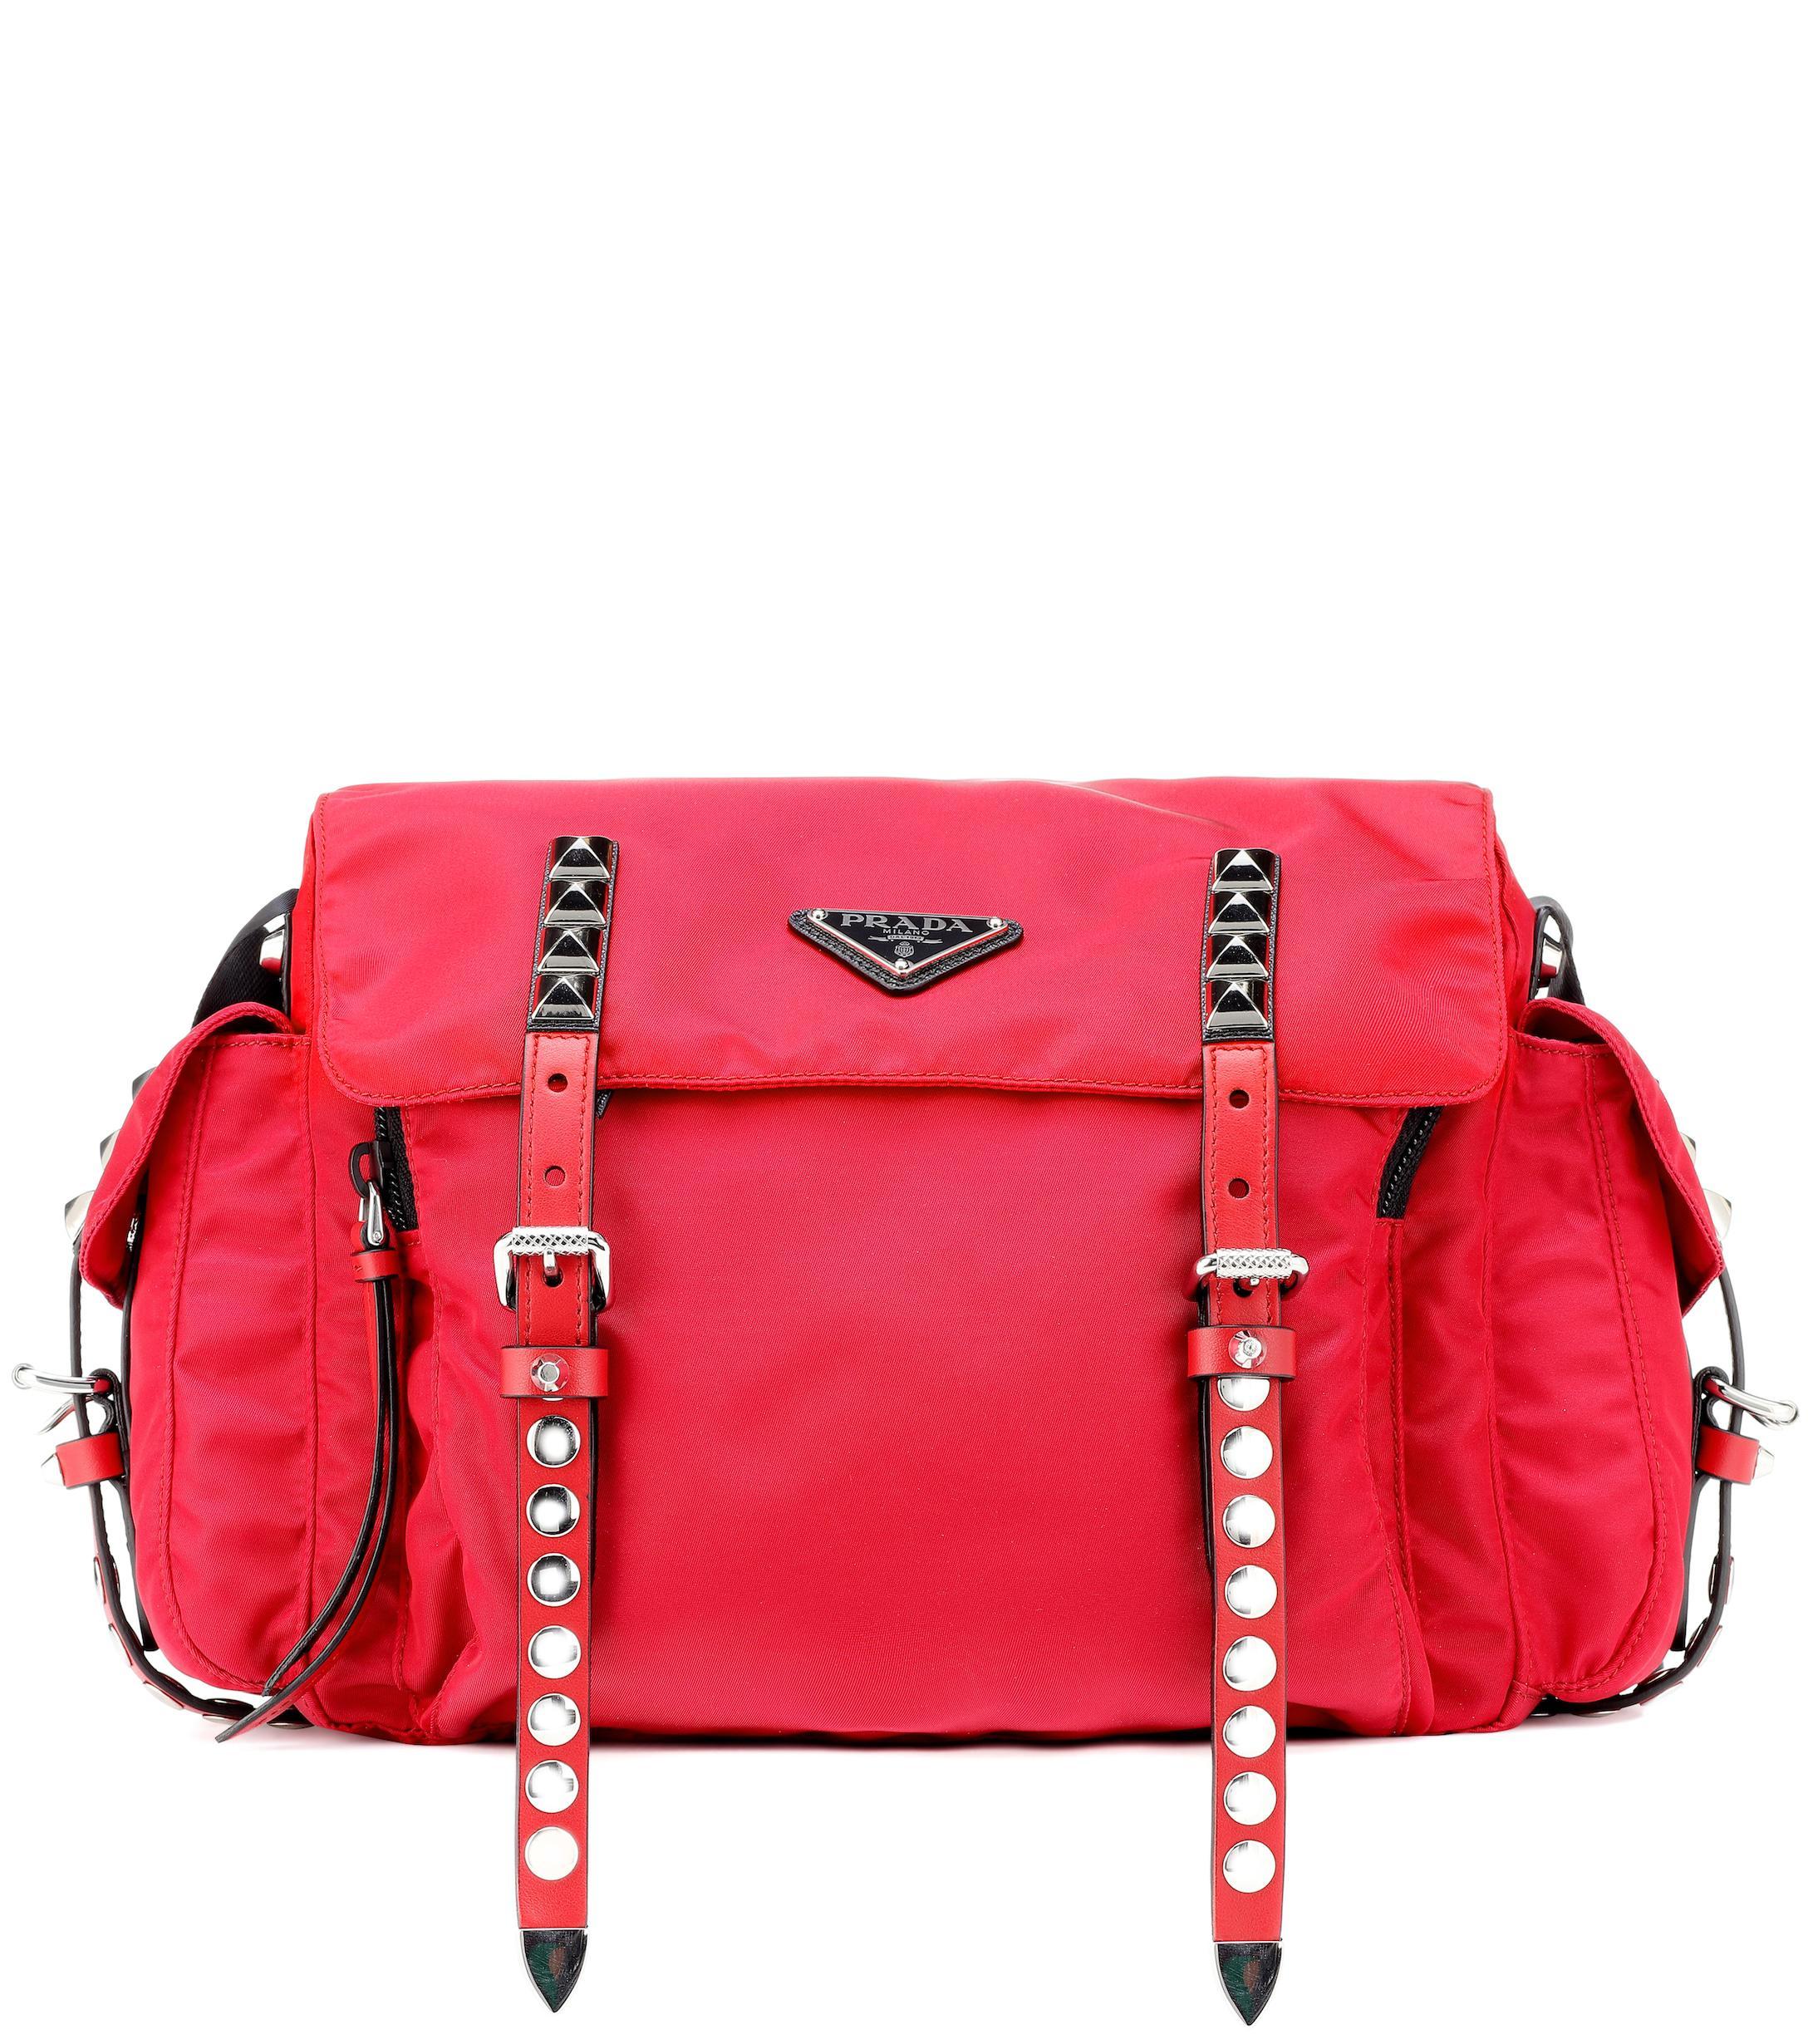 3cd9cf3da4e2 Prada Nylon Shoulder Bag in Red - Lyst